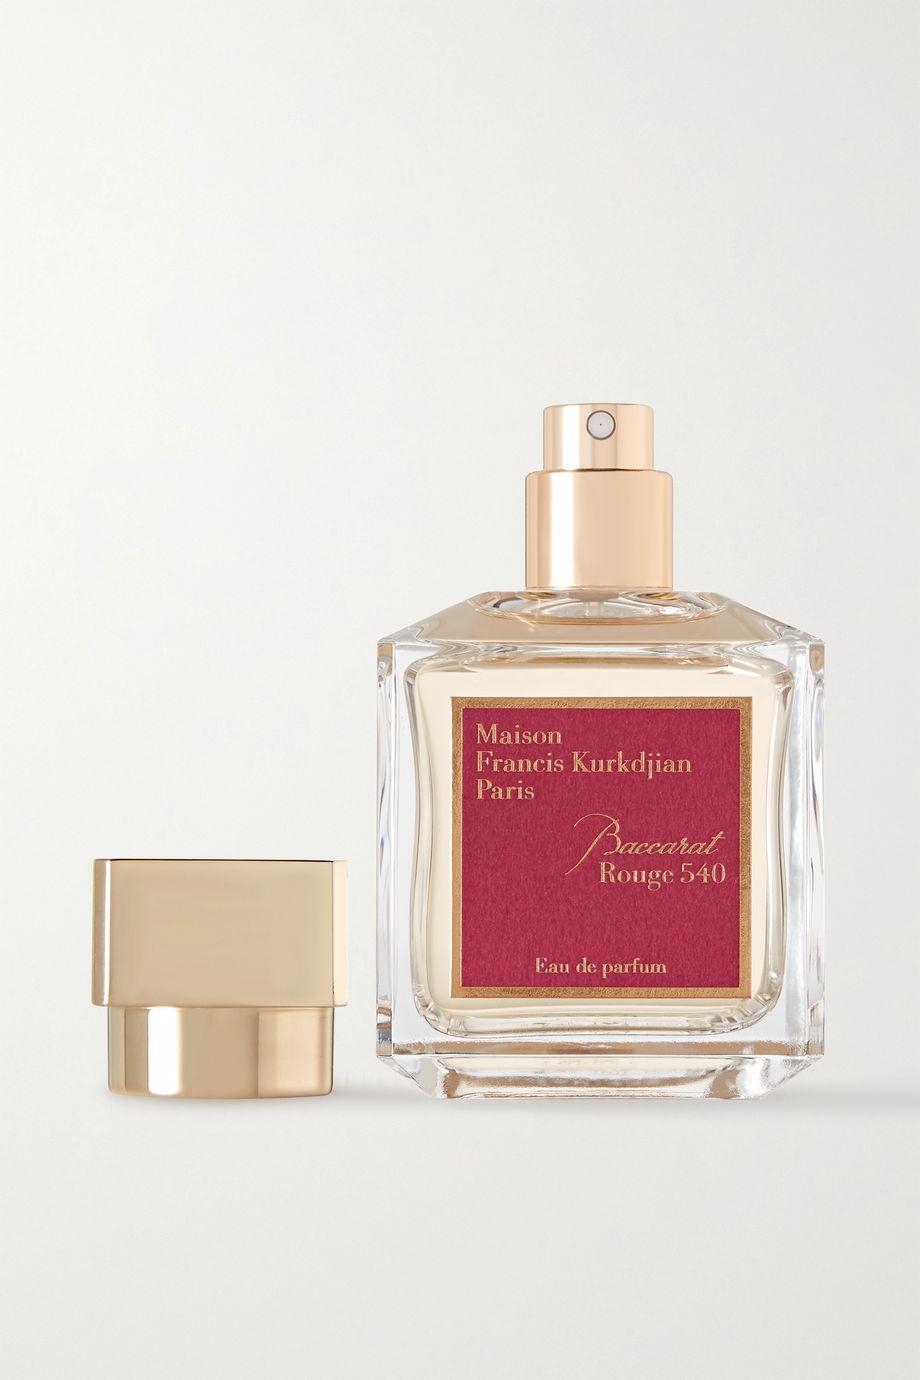 Maison Francis Kurkdjian Eau de parfum Baccarat Rouge 540, 70 ml